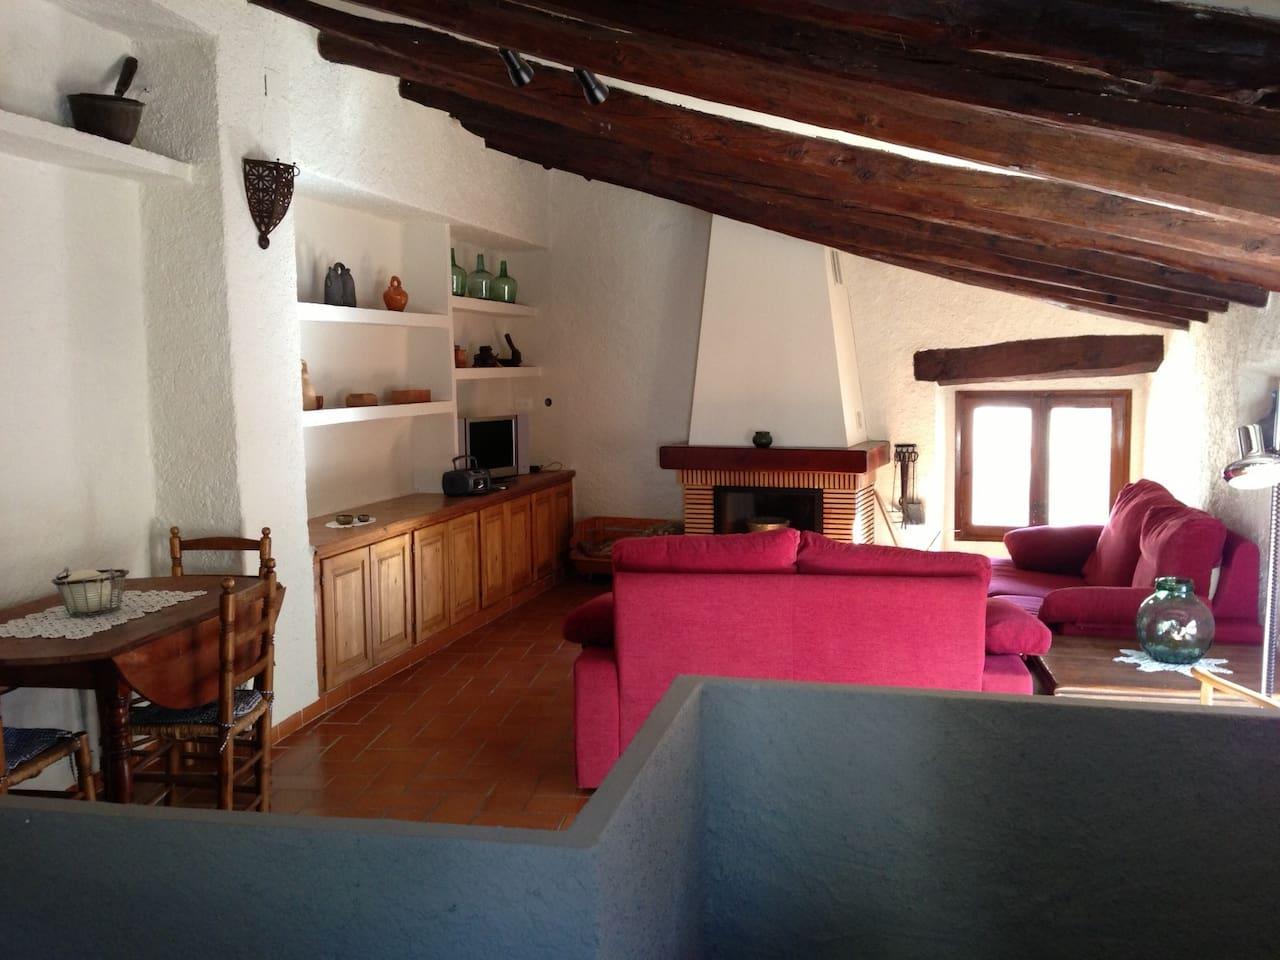 Acollidora casa de poble, a L'Argentera